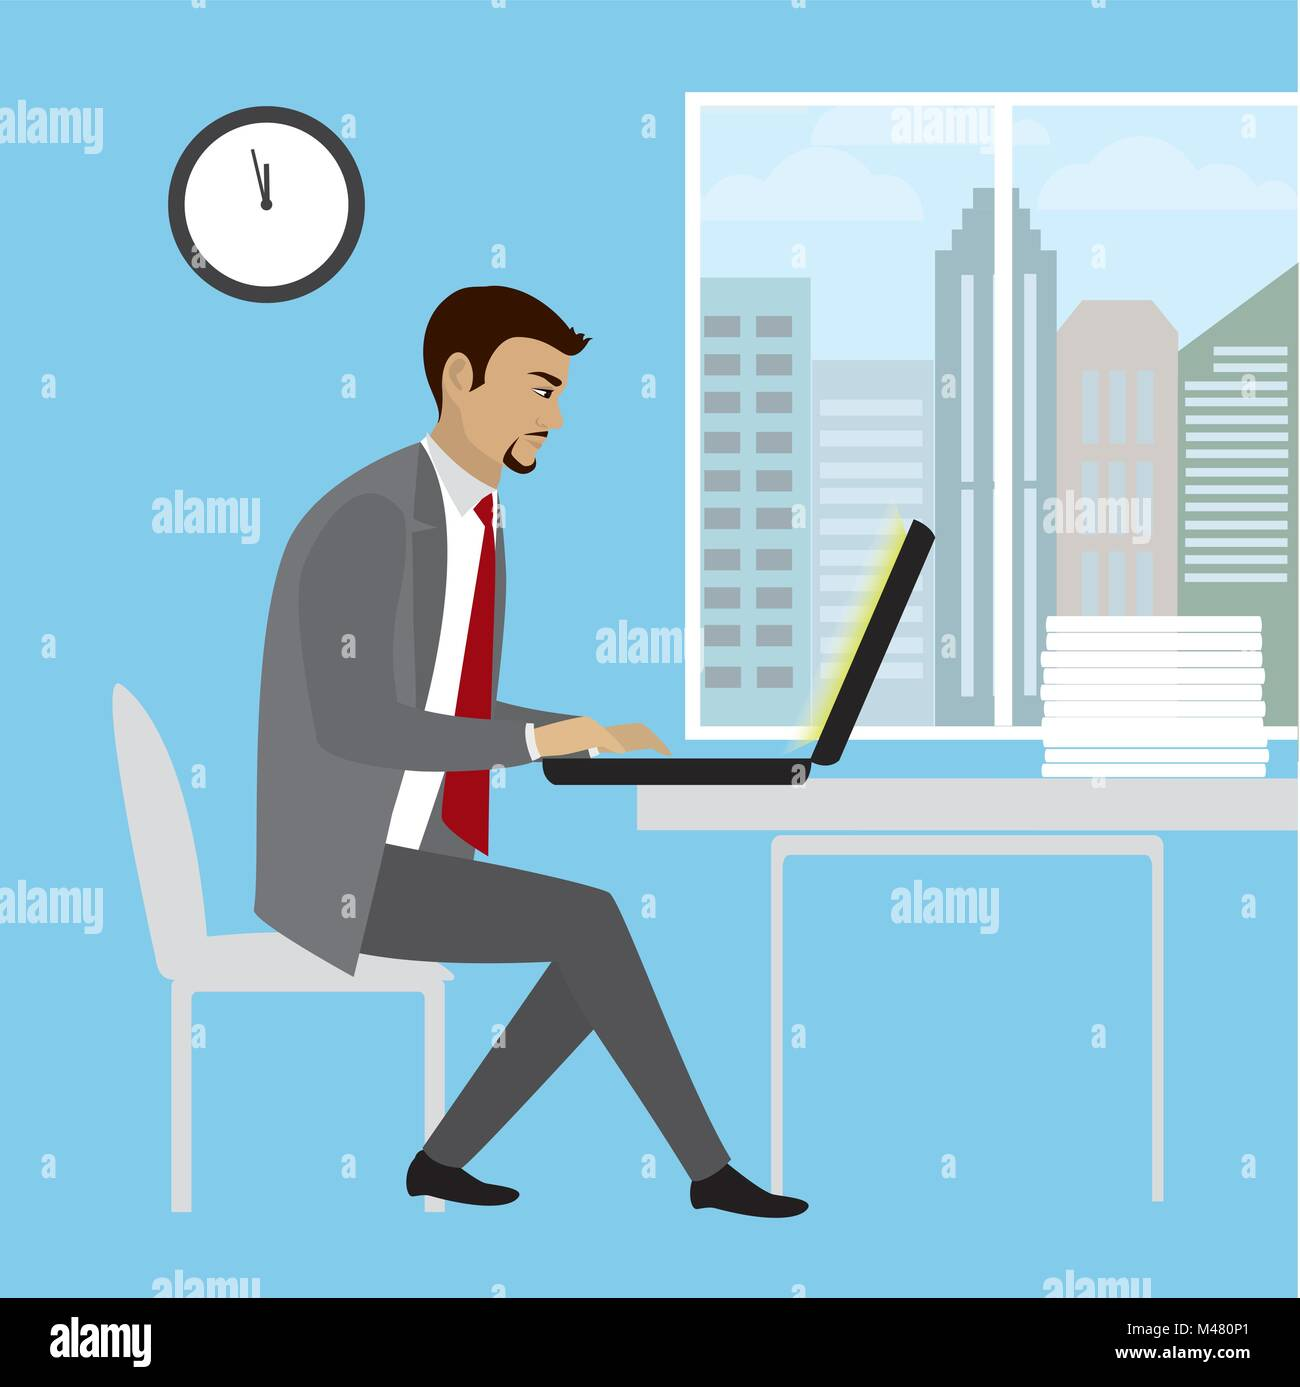 Office Worker Or Businessman Working On Laptop Computer Cartoon Stock Vector Image Art Alamy